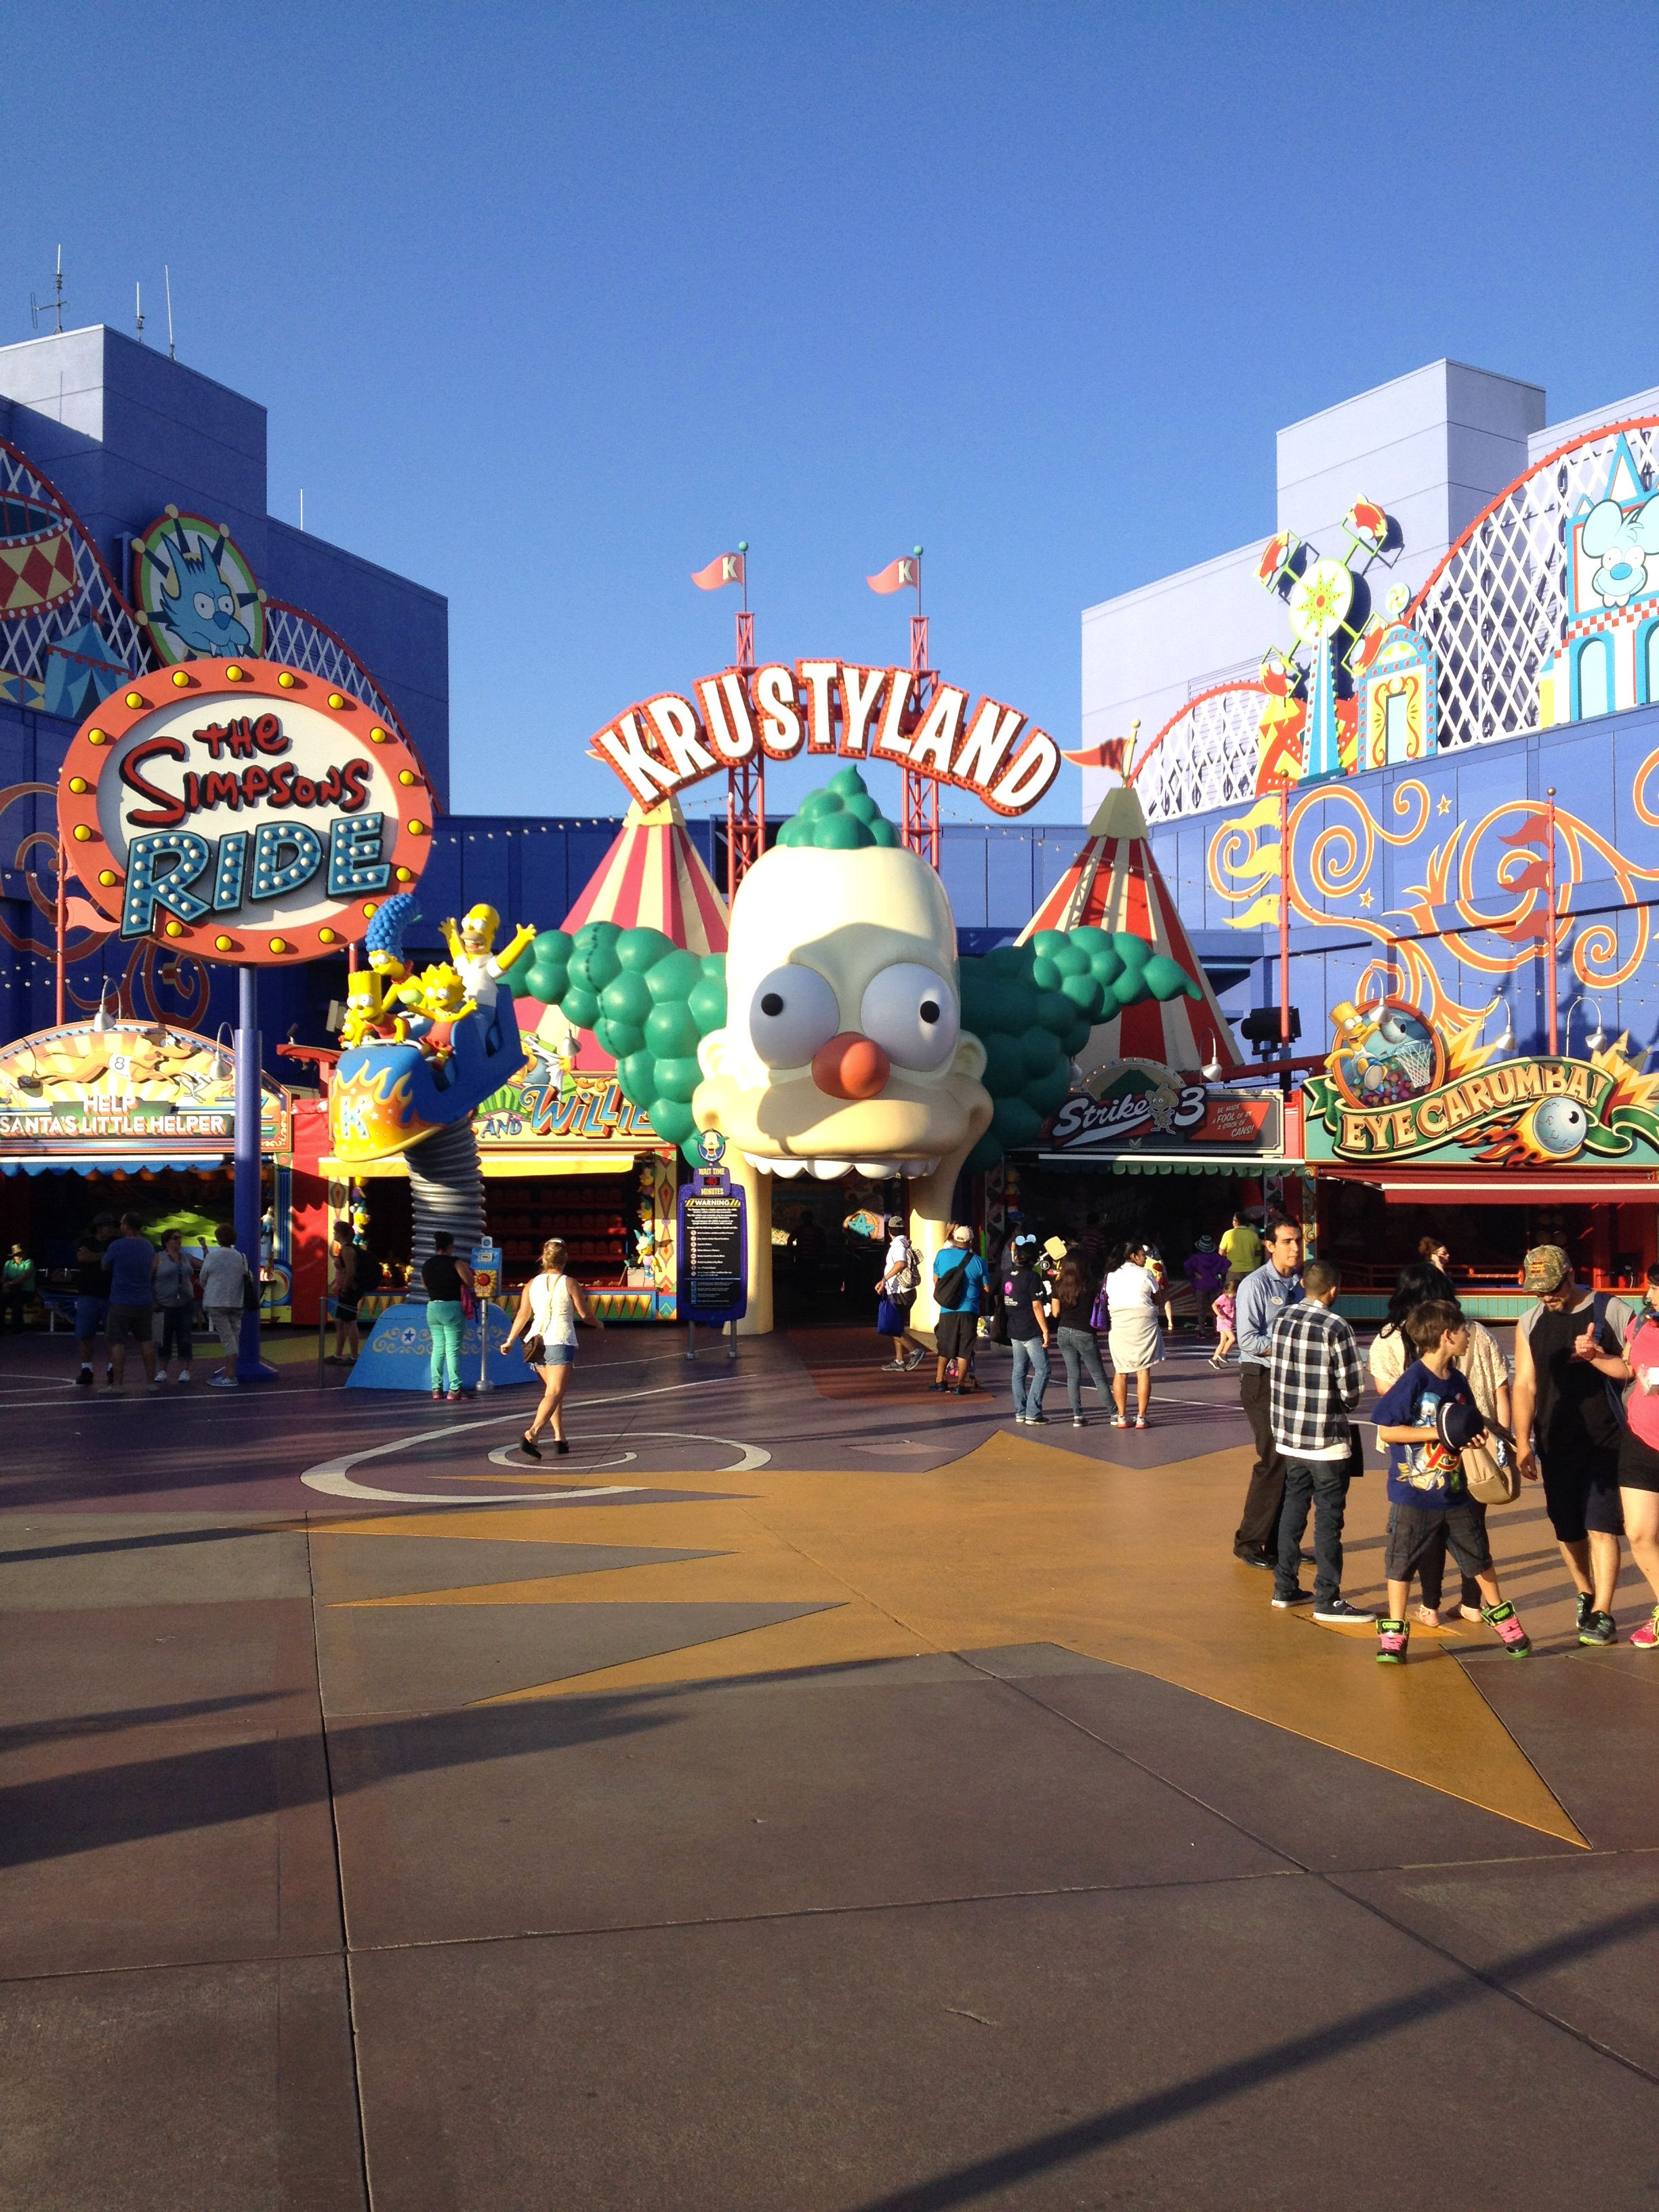 Krusty Land Universal Studio Los Angeles Universal Studios Studios Los Angeles Orlando Florida